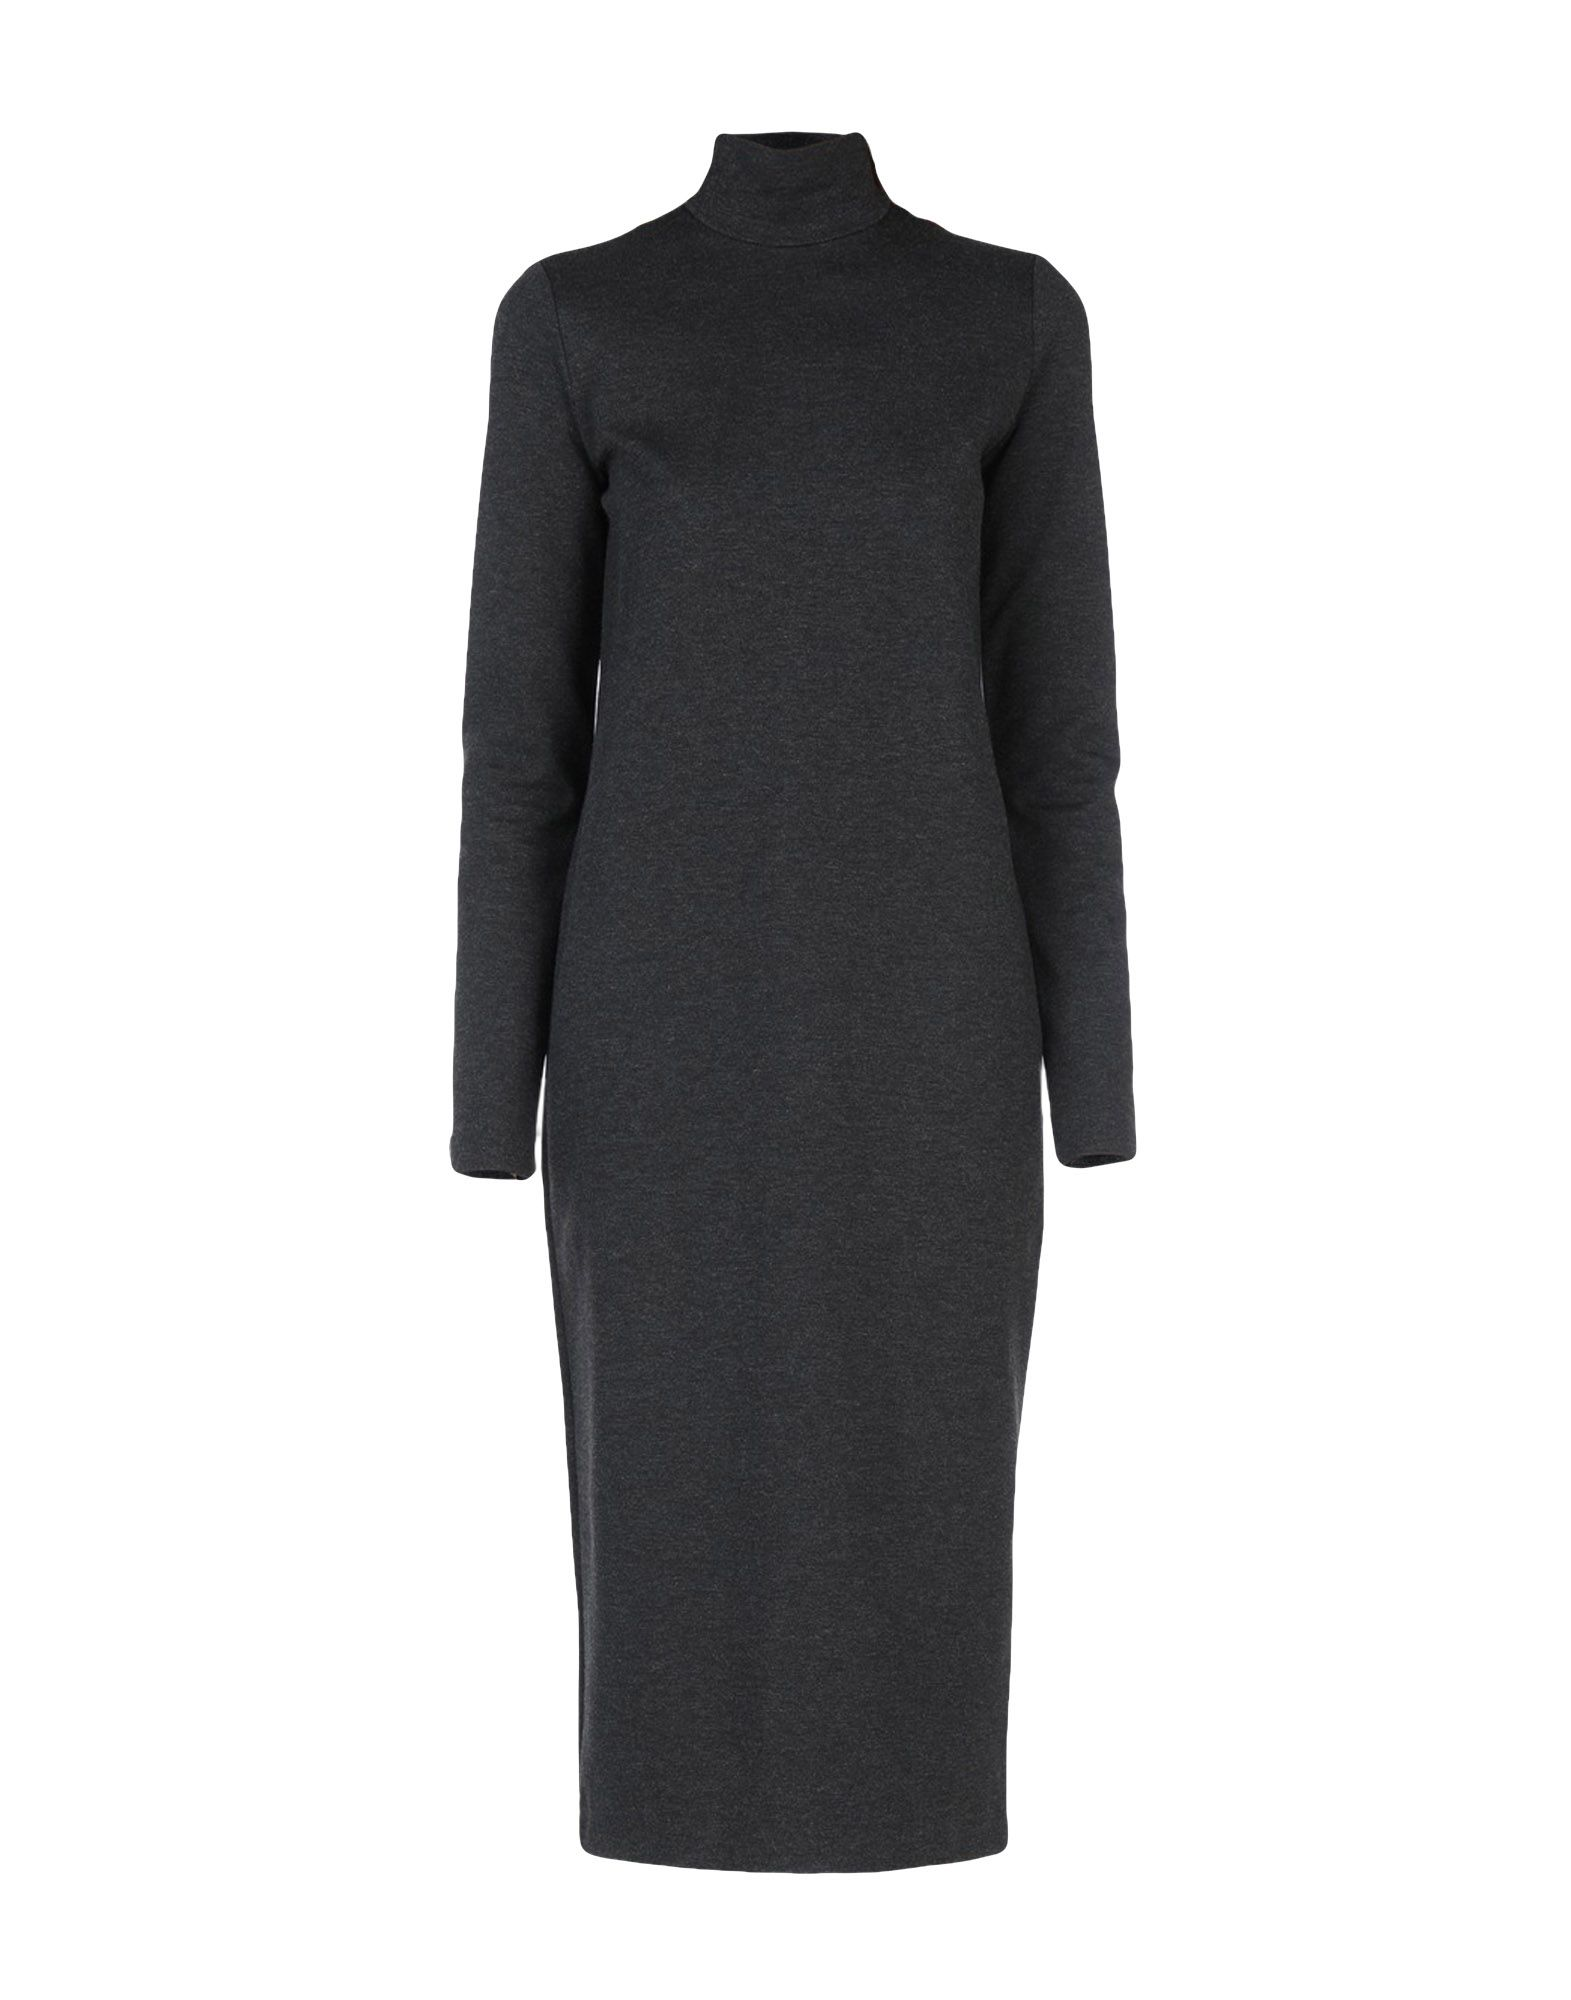 JIL SANDER NAVY | JIL SANDER NAVY 3/4 Length Dresses 34882099 | Goxip